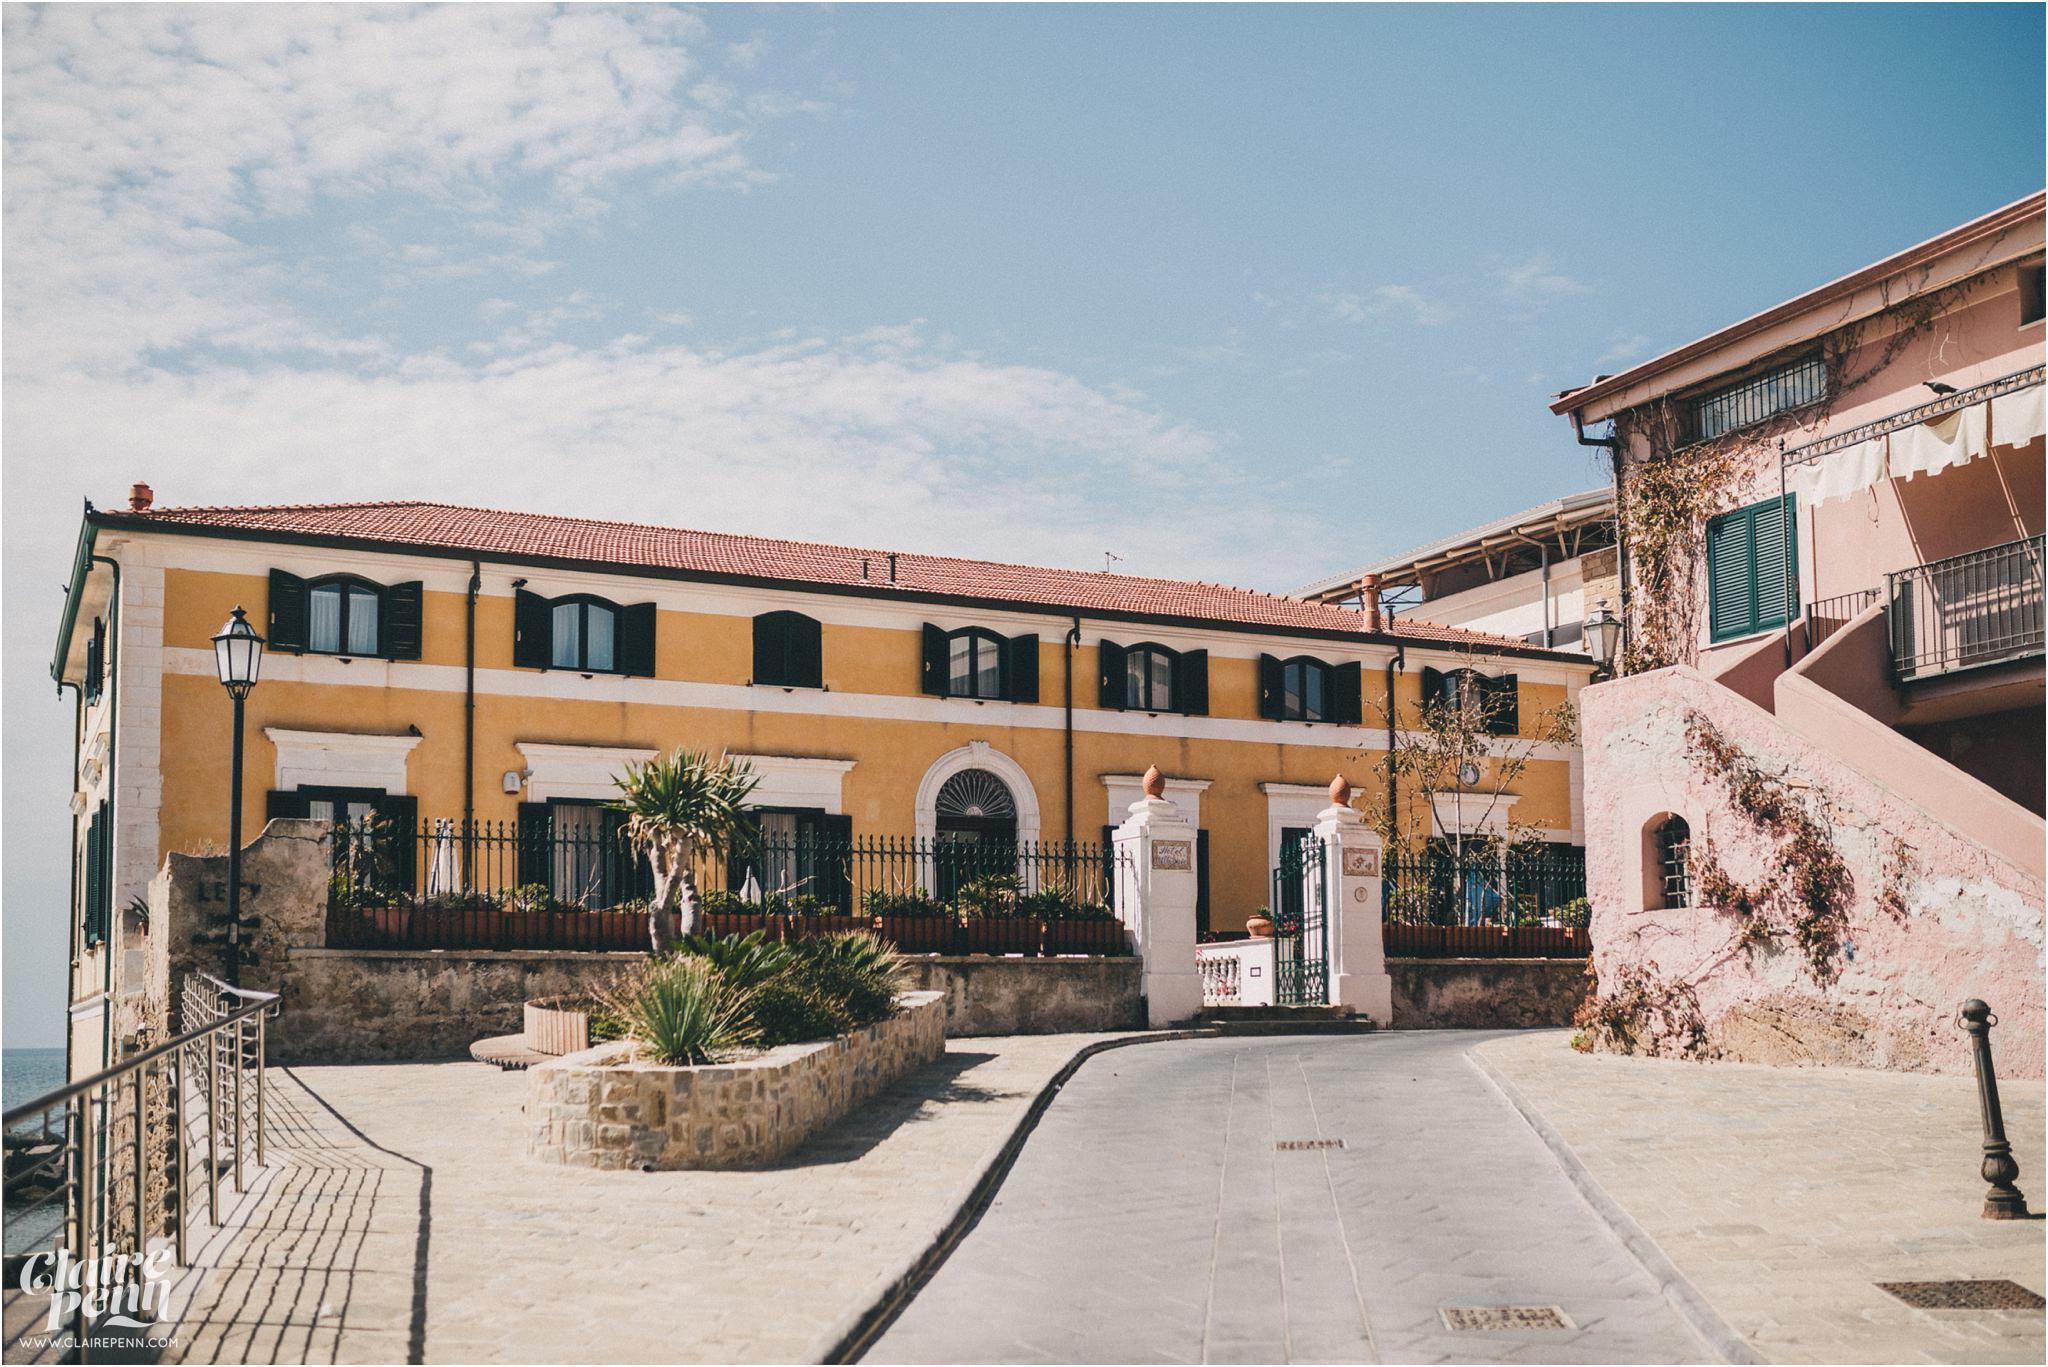 Hilltop destination wedding Santa Maria di Castellabate Italy_0002.jpg